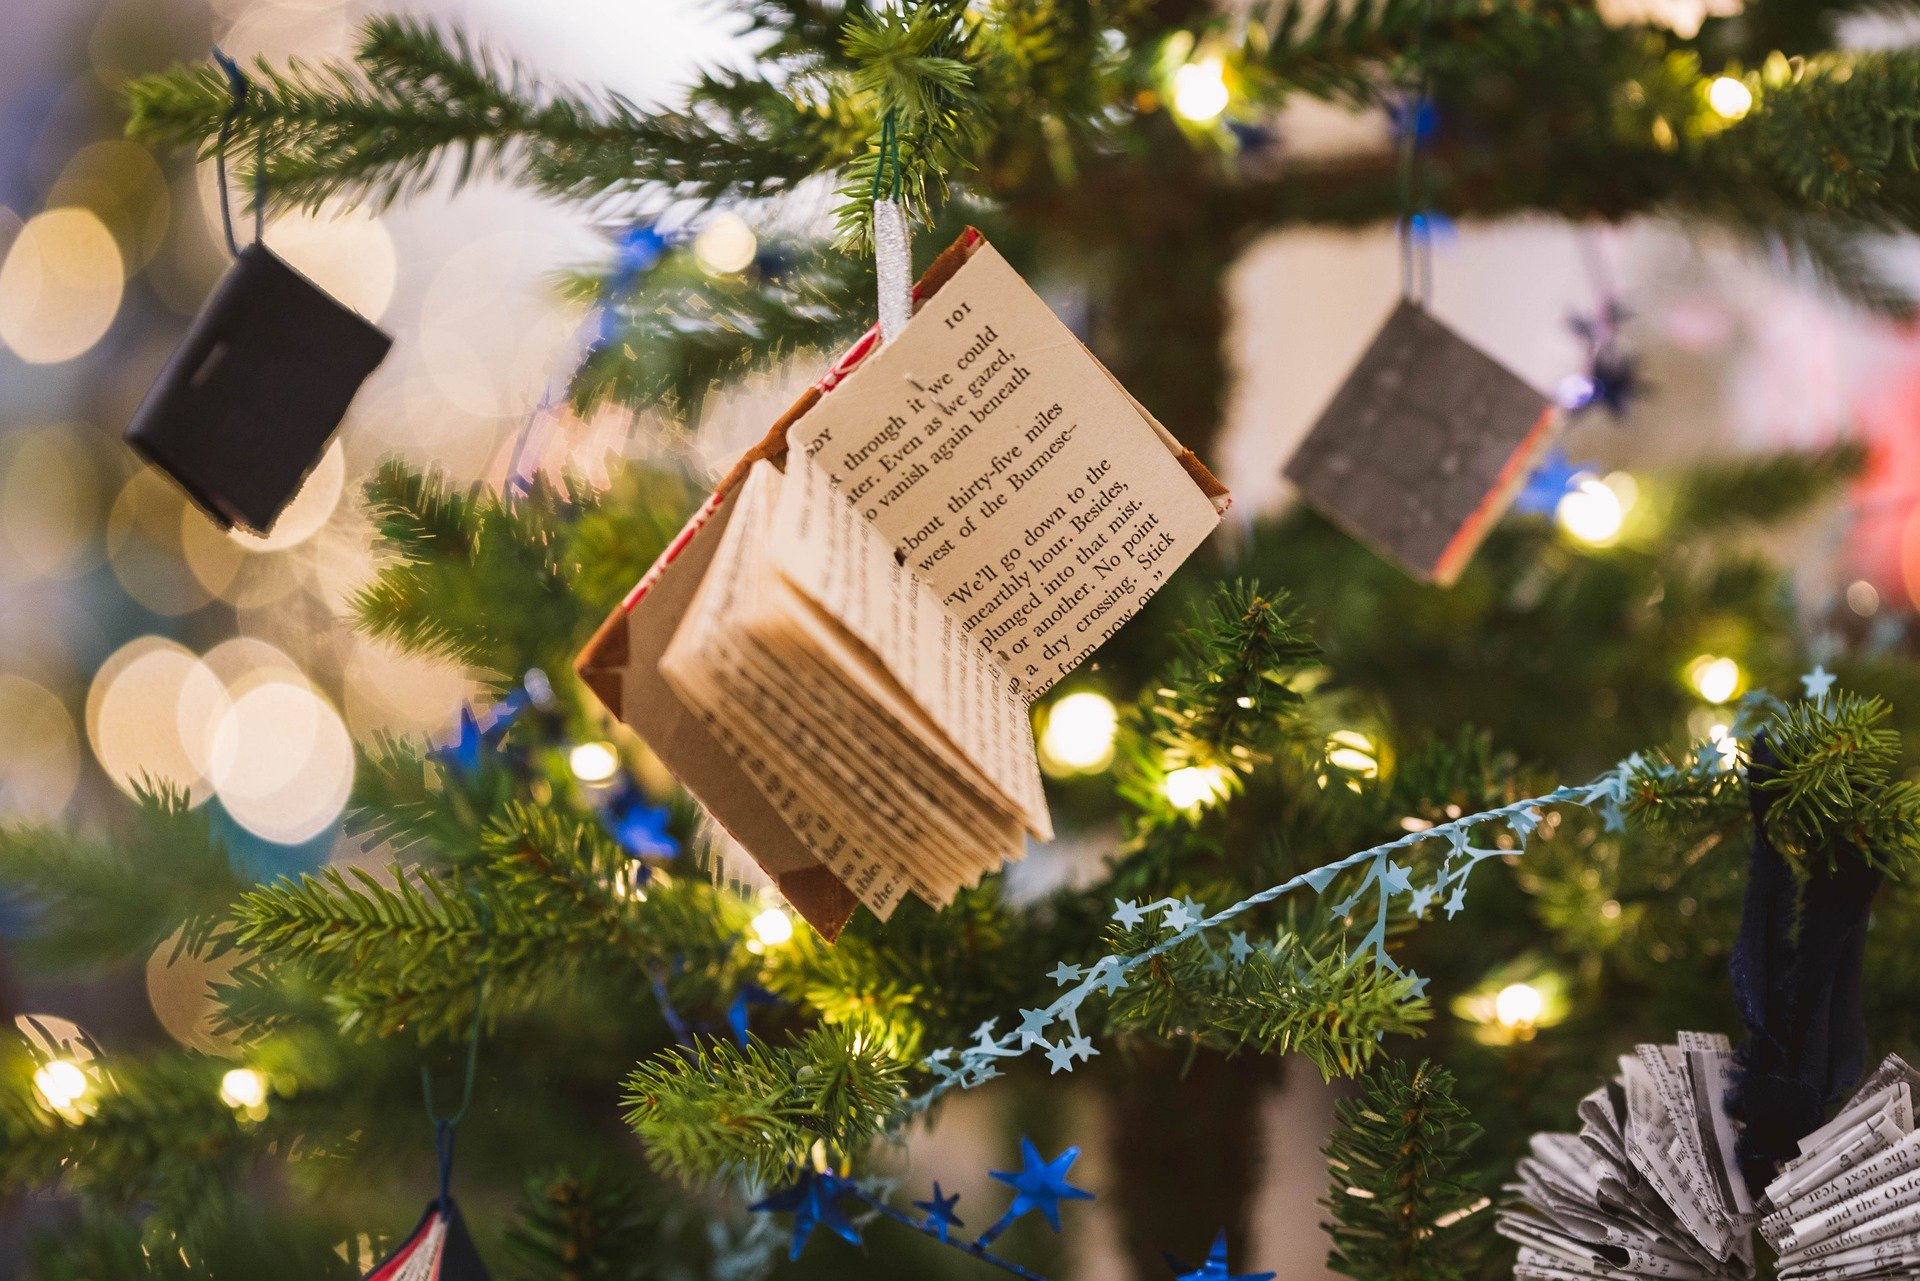 Libri a Natale